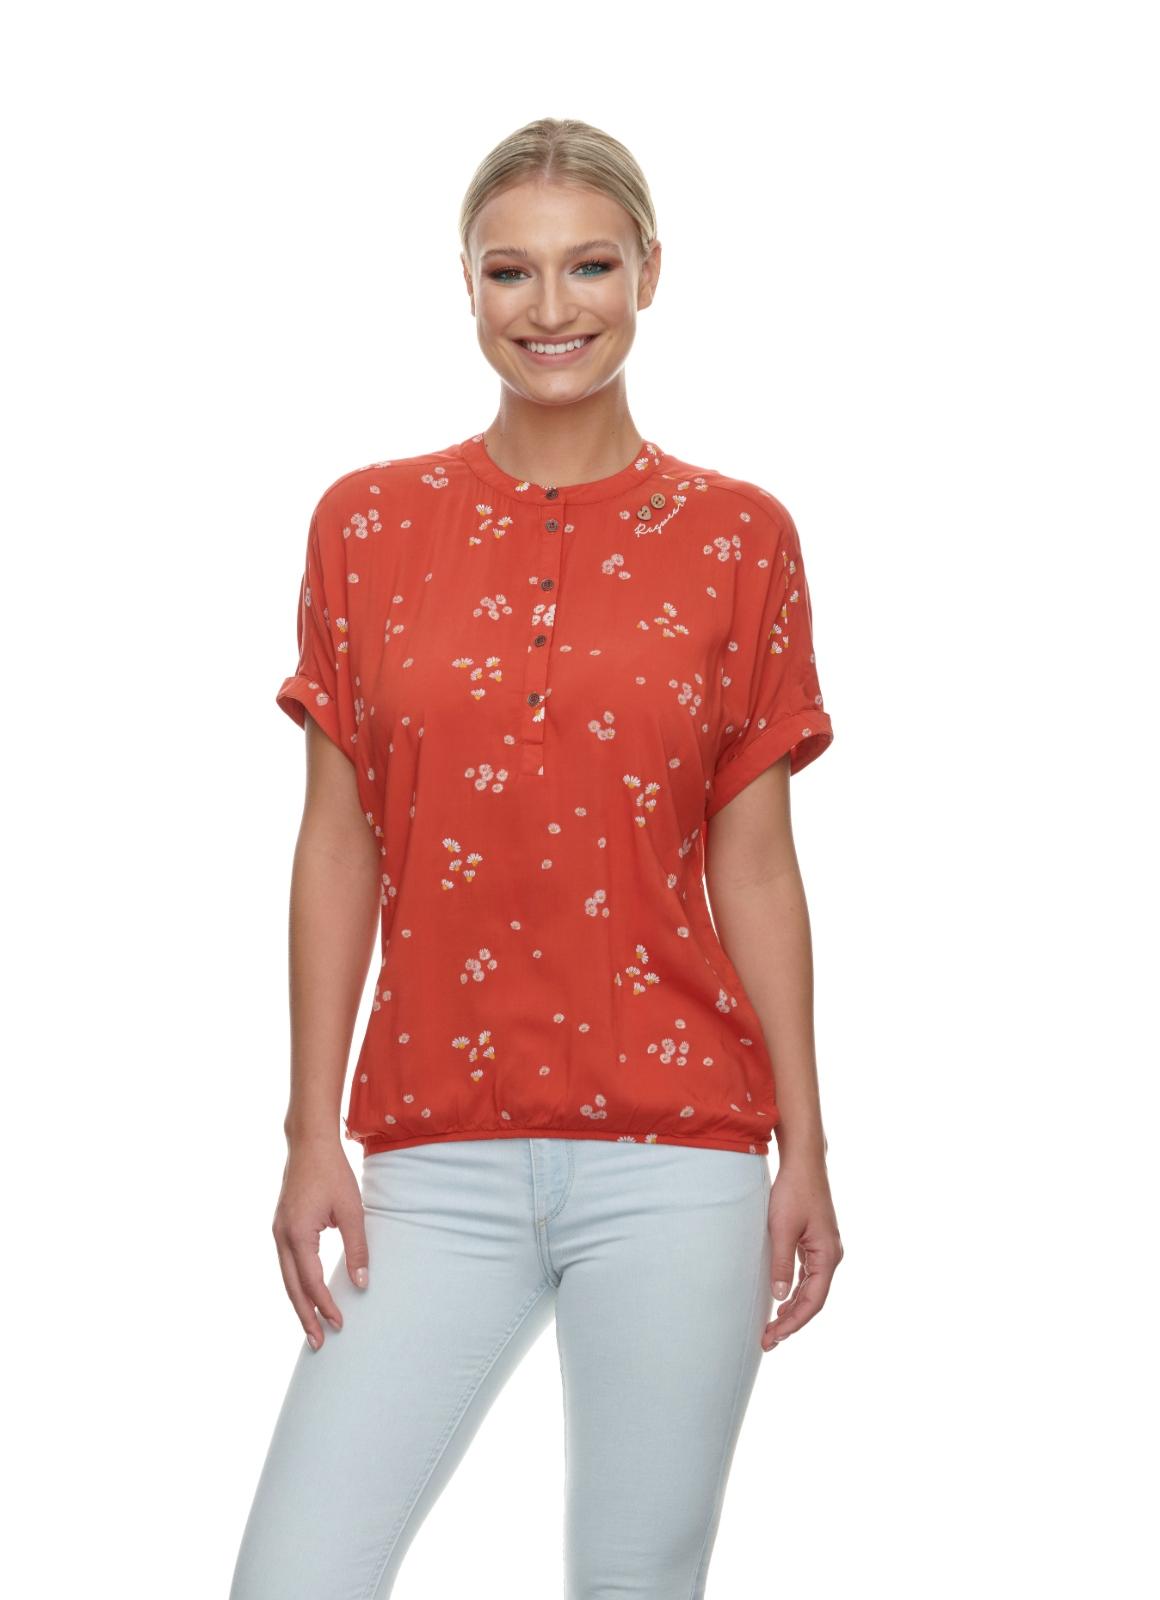 RAGWEAR-RICOTA-CAMOMILE-Shirt-chili-red